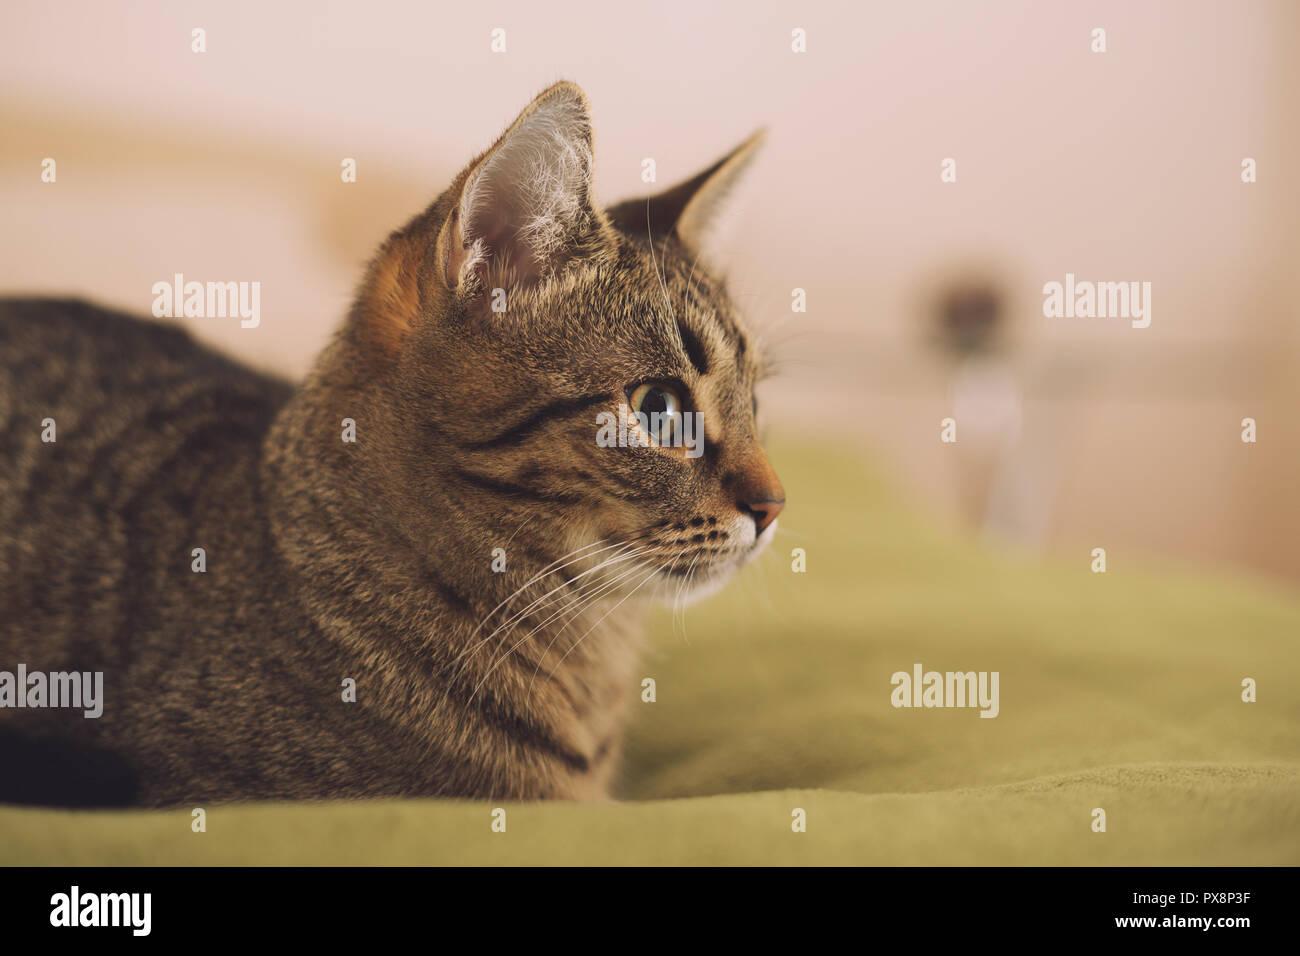 Foto de la hermosa joven gato tumbado en la cama. Imagen De Stock